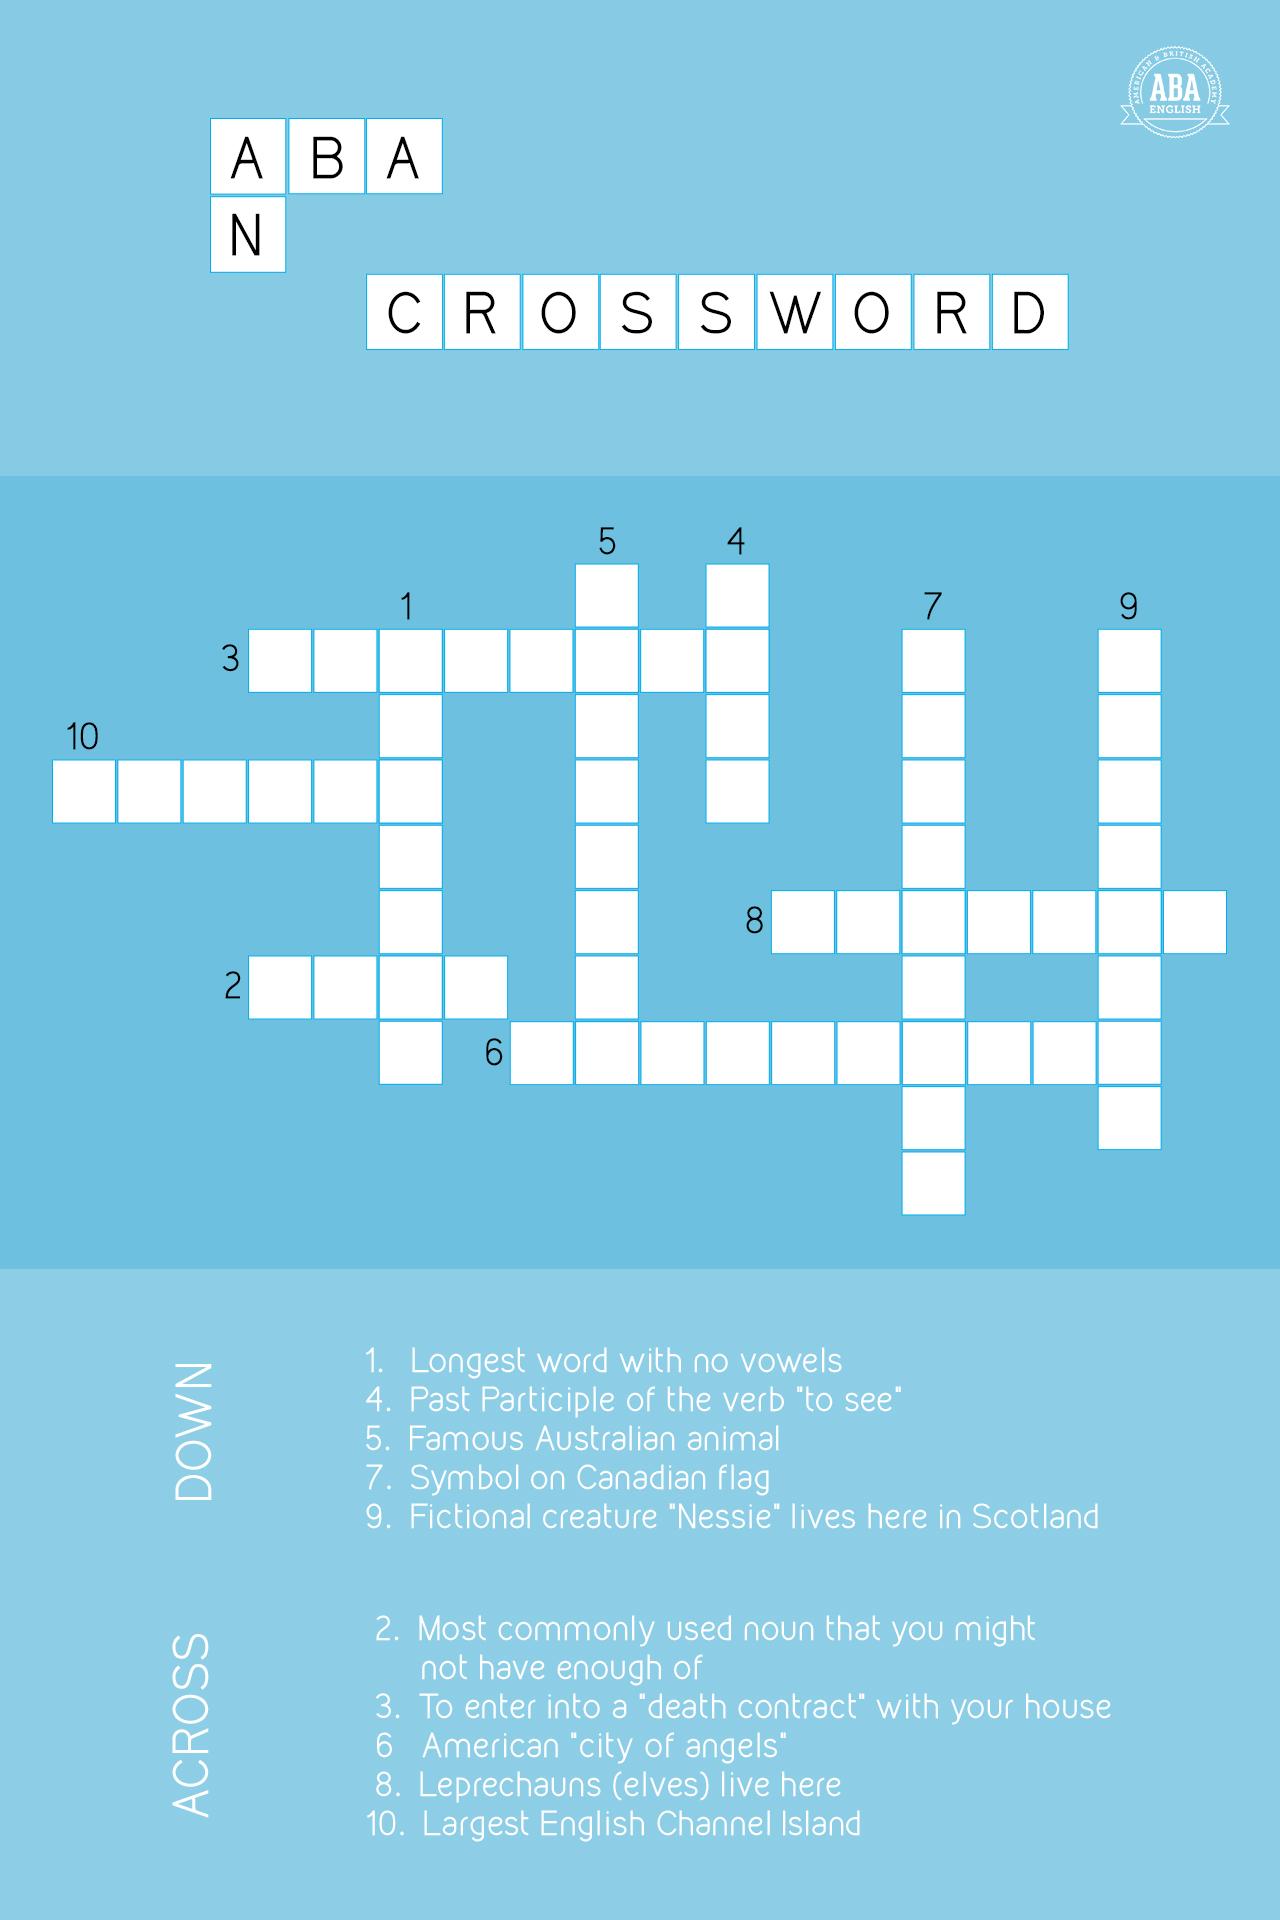 Kreuzworträtsel-23-april-abaenglish